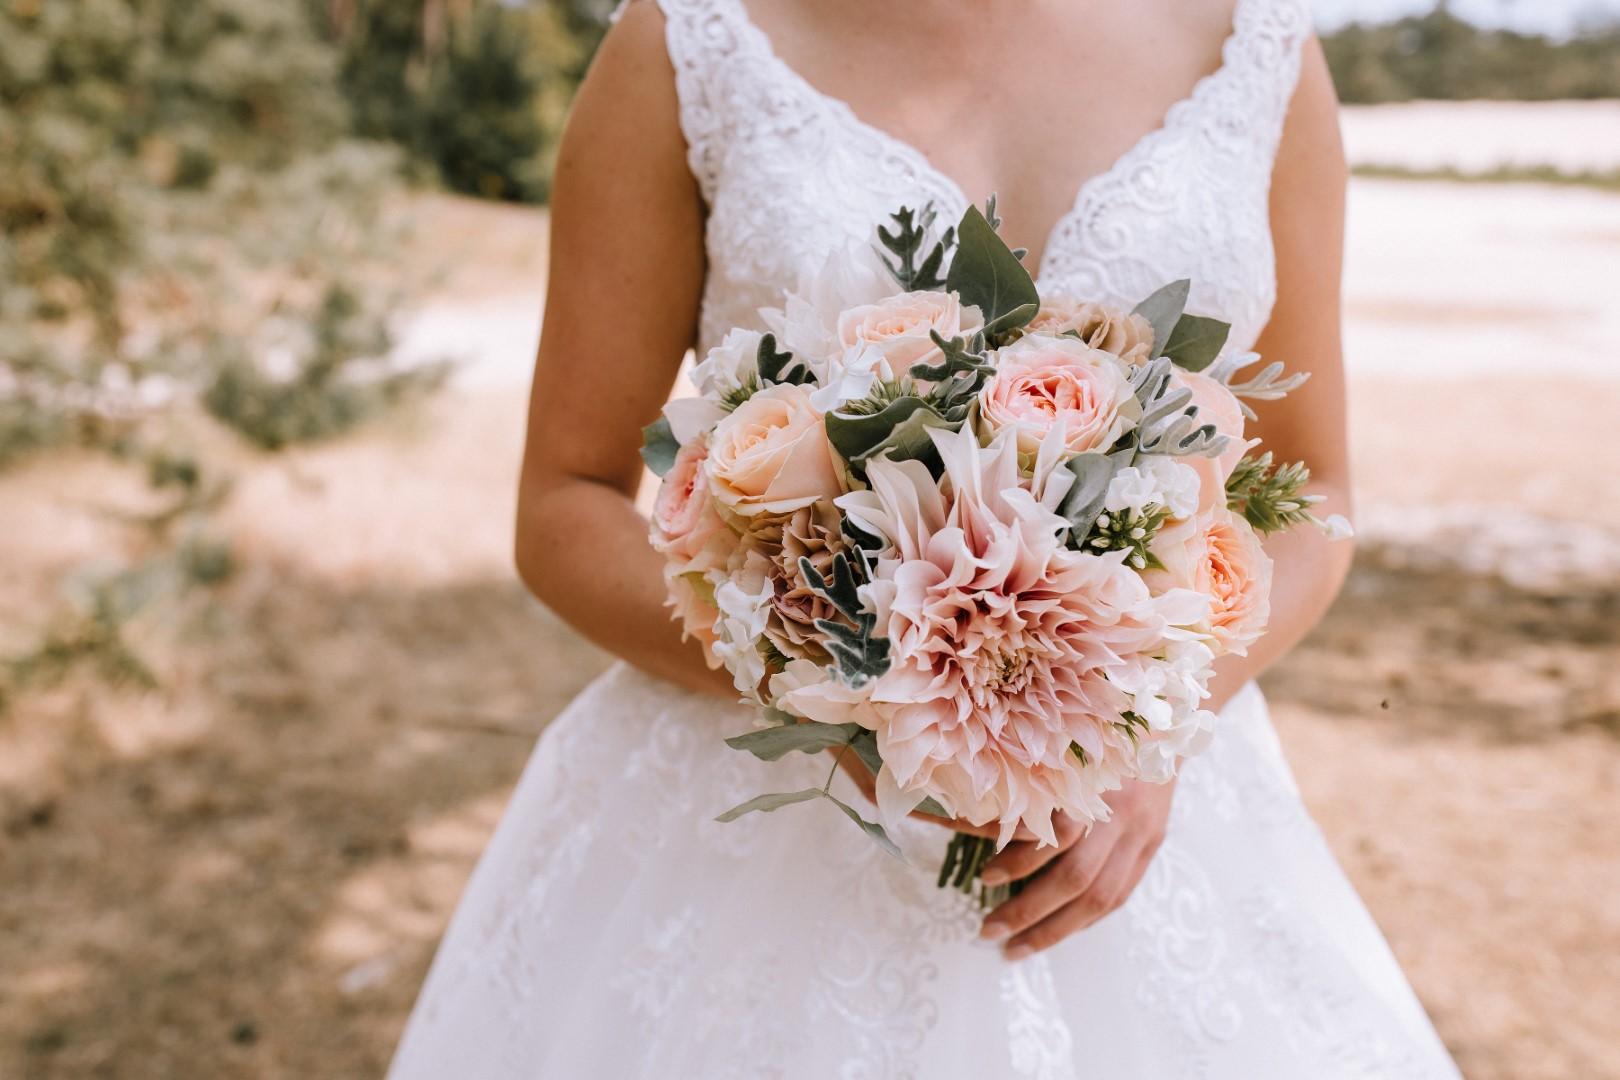 bruidsboeketten_boho_style_assen_broger_dalfsen_bruidsbloemist_bloemist_nummer_1_in_bruidsboeketten